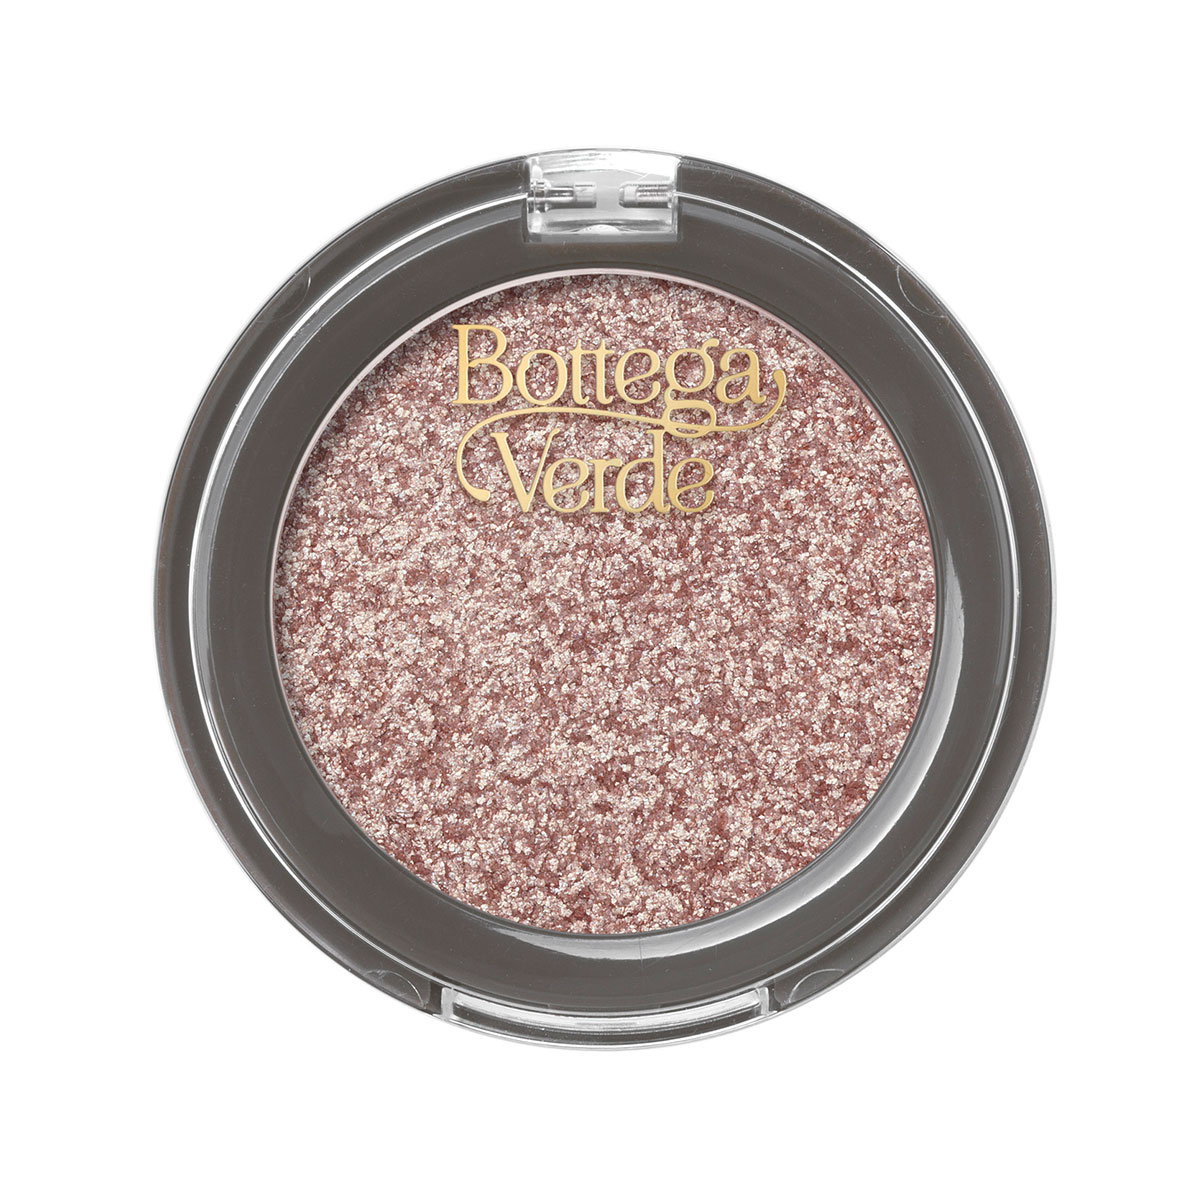 Fard de ochi cu extract de rodie, roz-auriu, 2.5 G